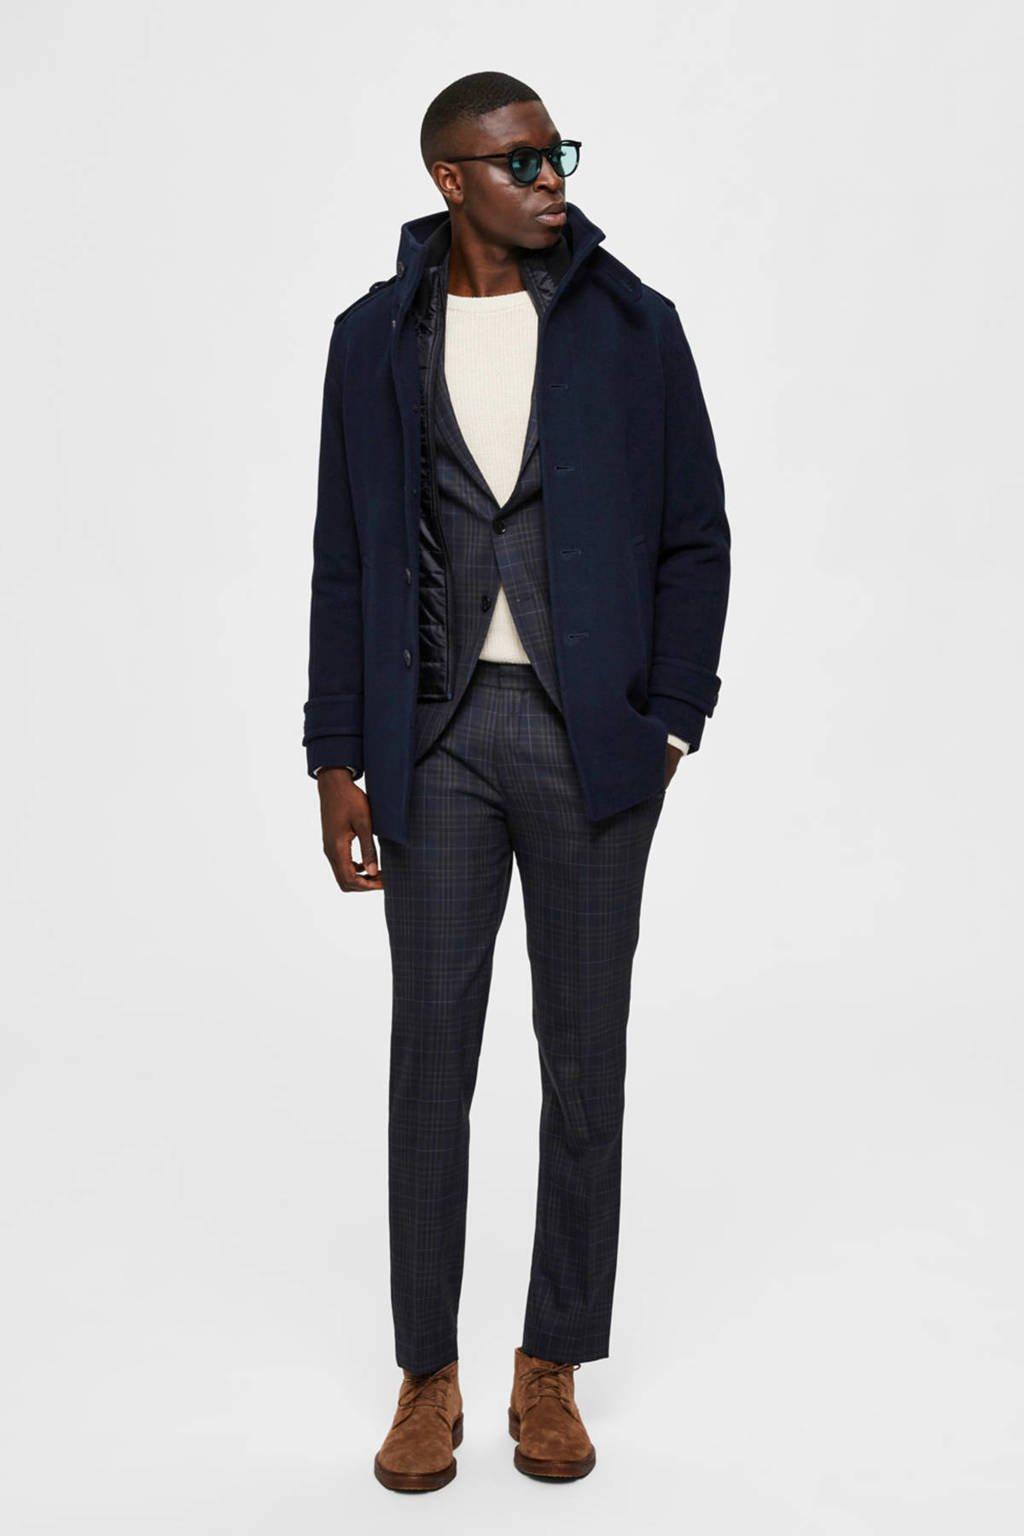 SELECTED HOMME jas met wol donkerblauw, Donkerblauw